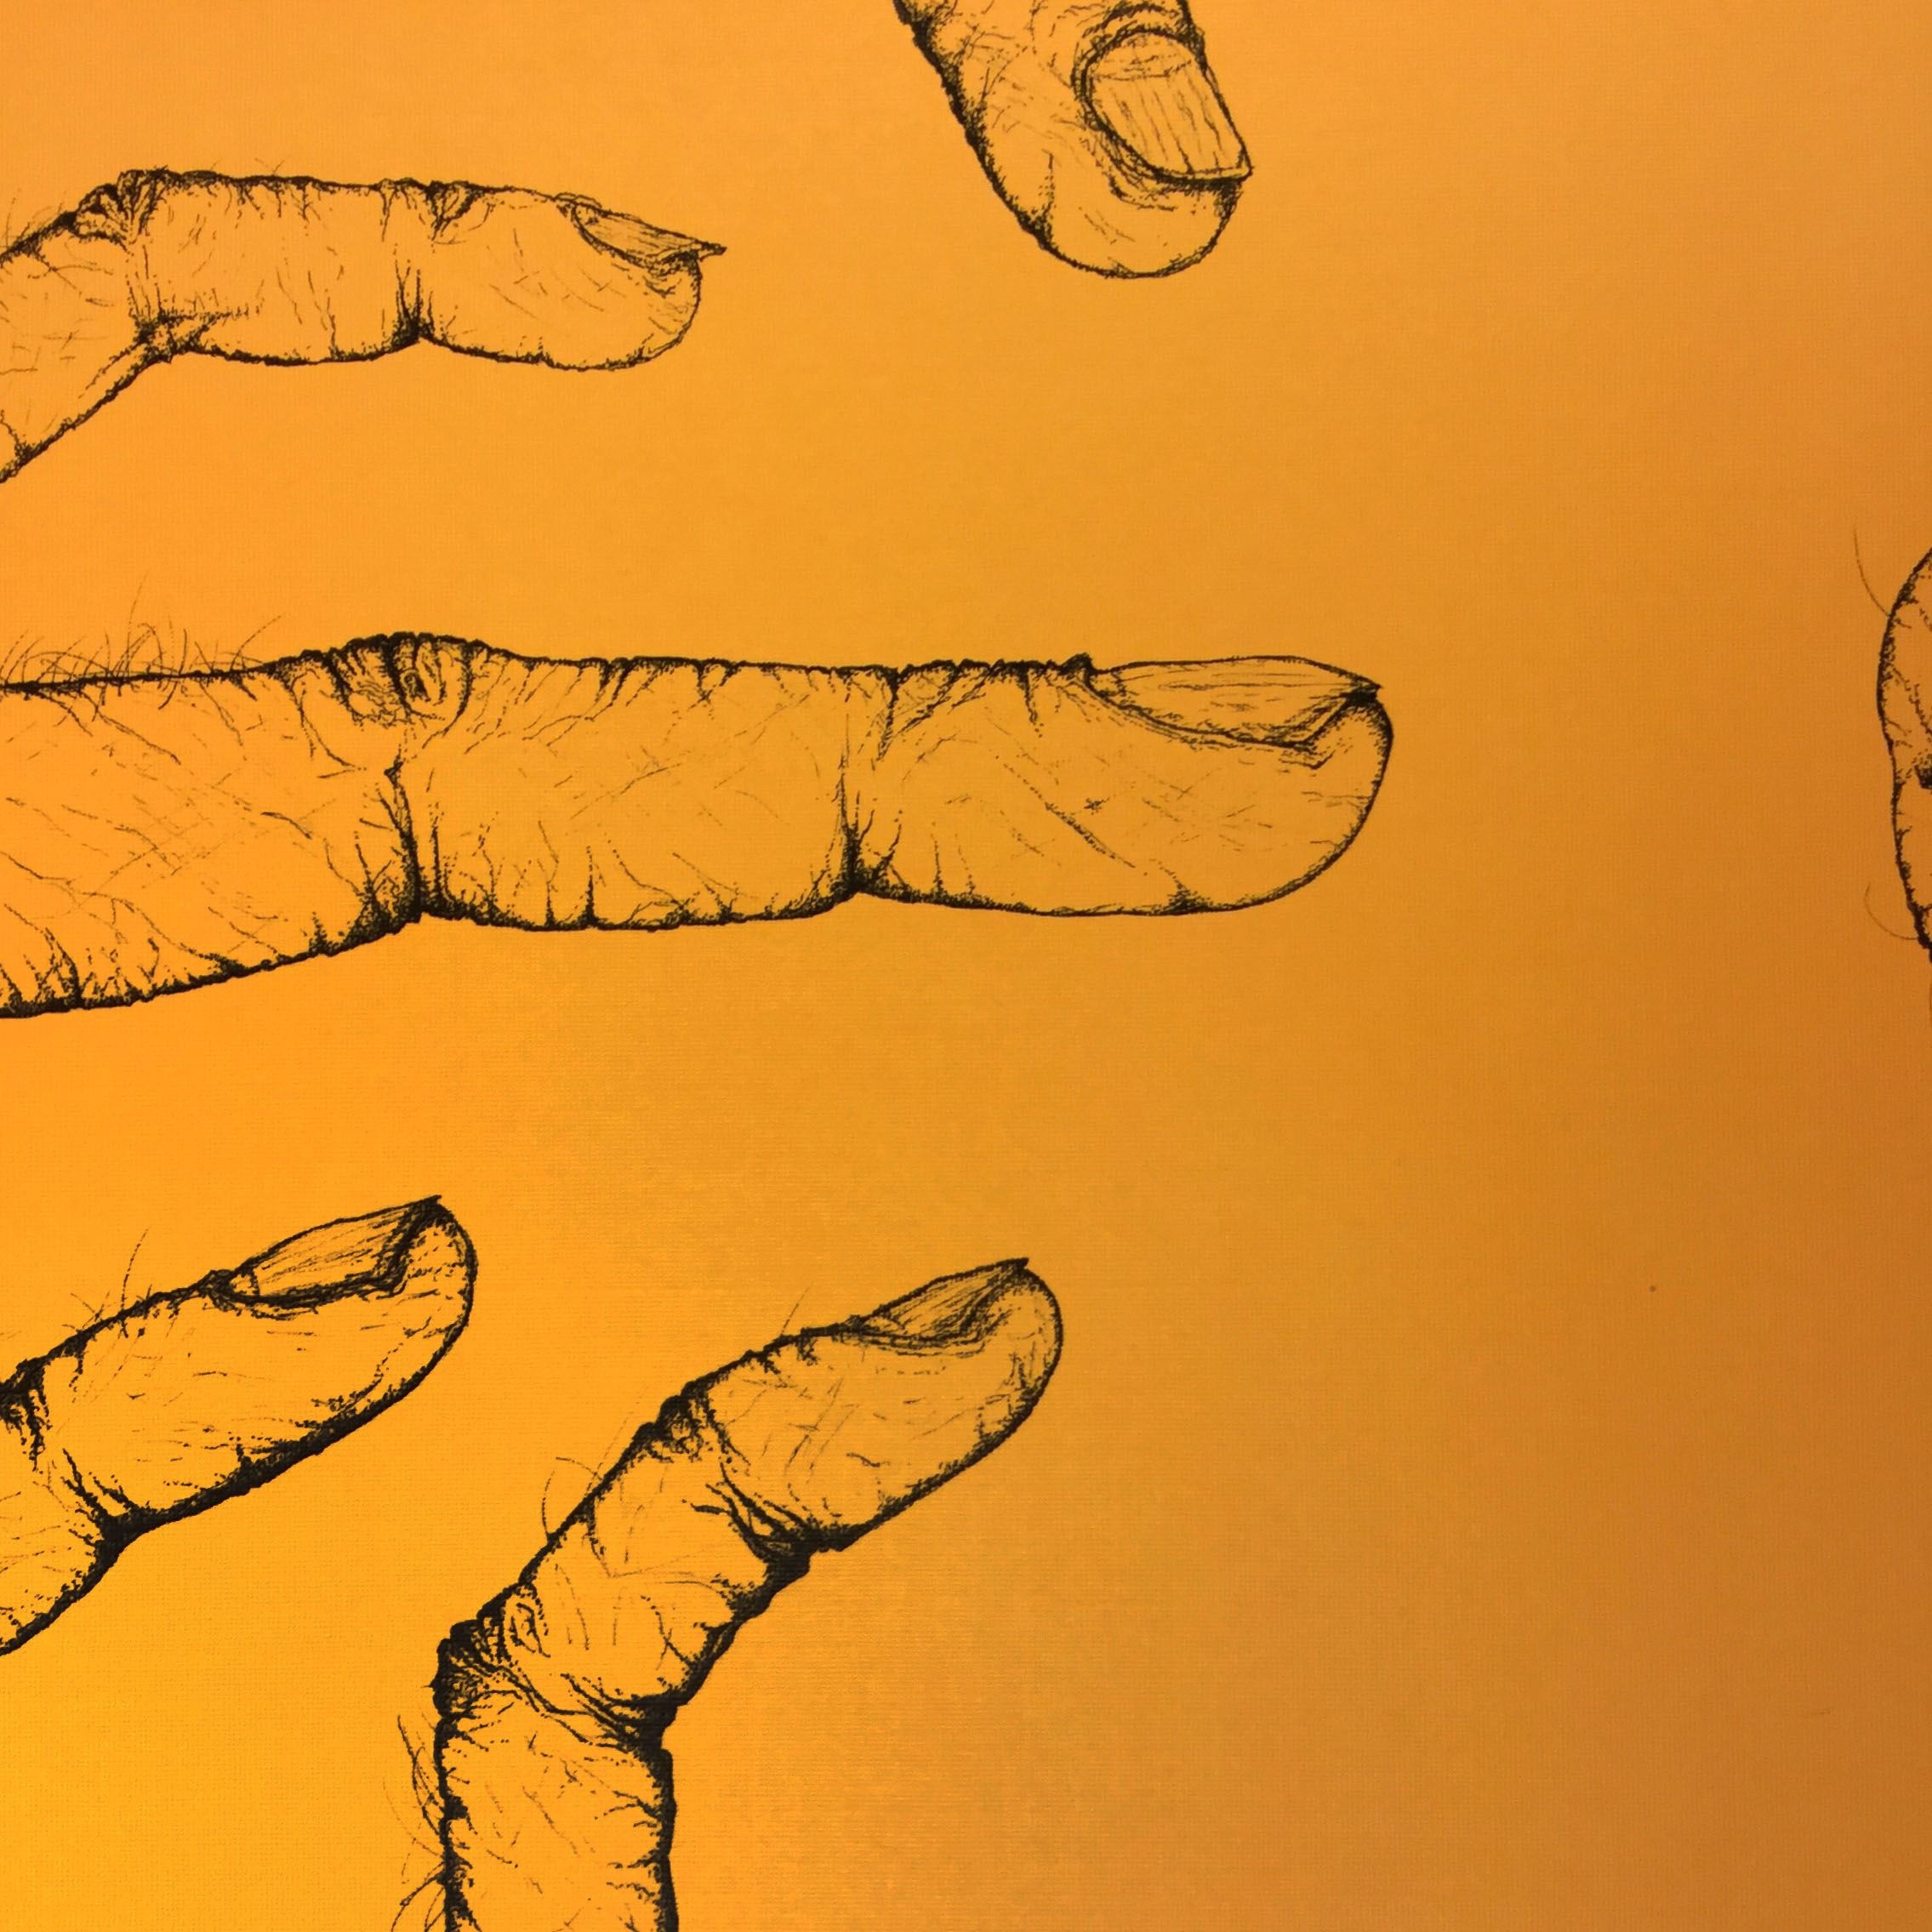 Accusing Fingers